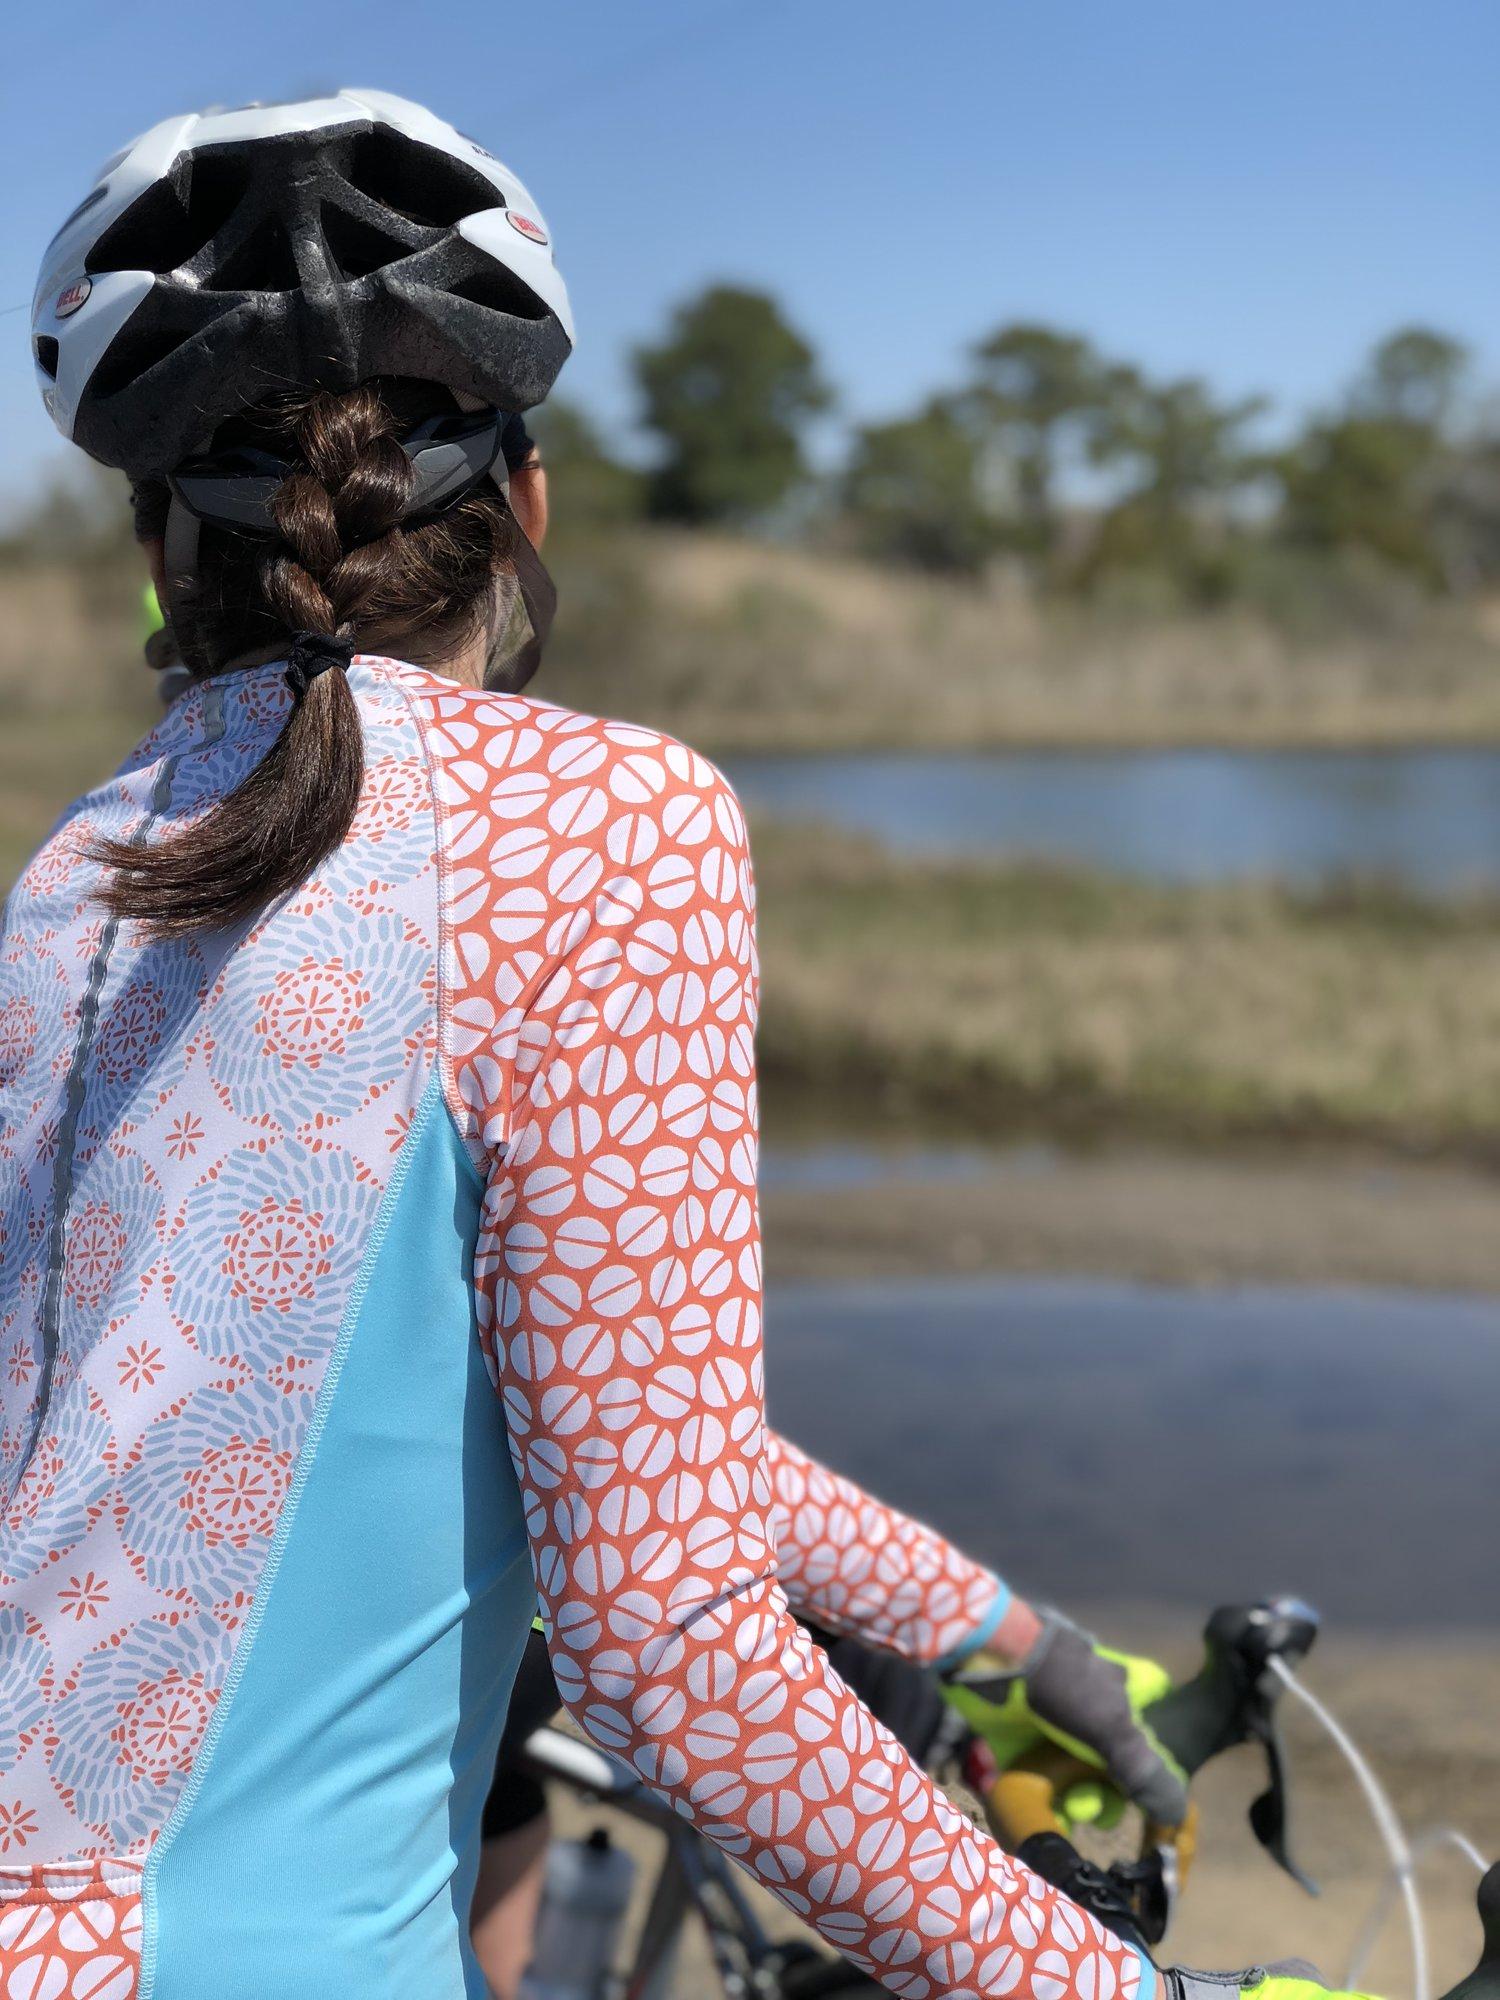 SassyCyclist — Exceptional Women s Cycling Jerseys   Gear 9f25f6312